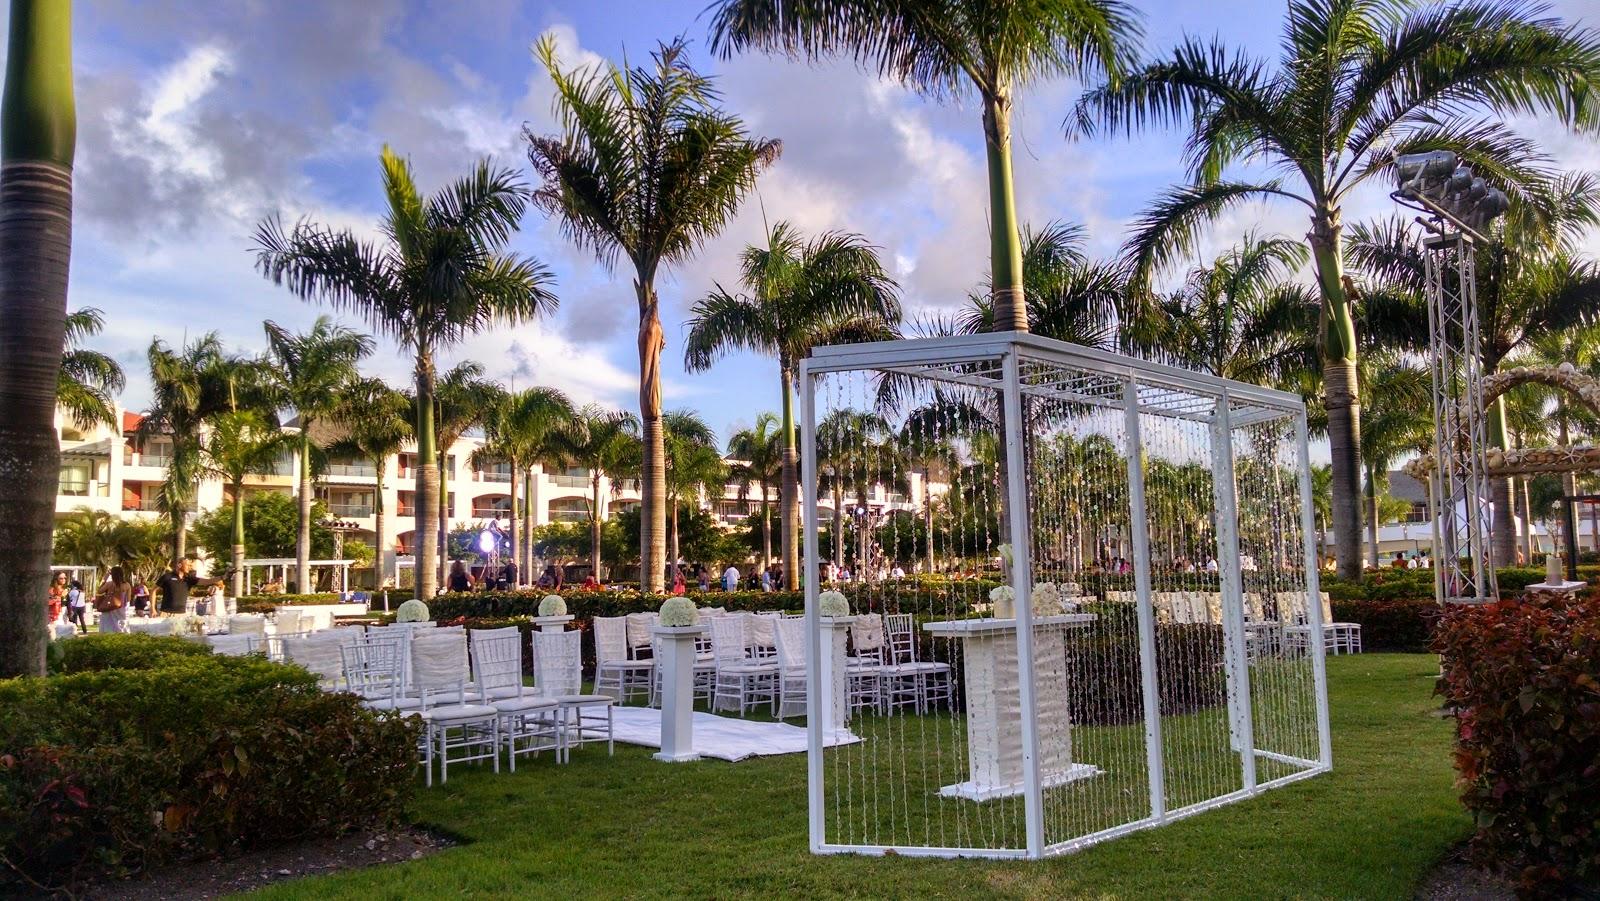 Hard Rock Hotel Punta Cana And Wow Wedding Specialist Program